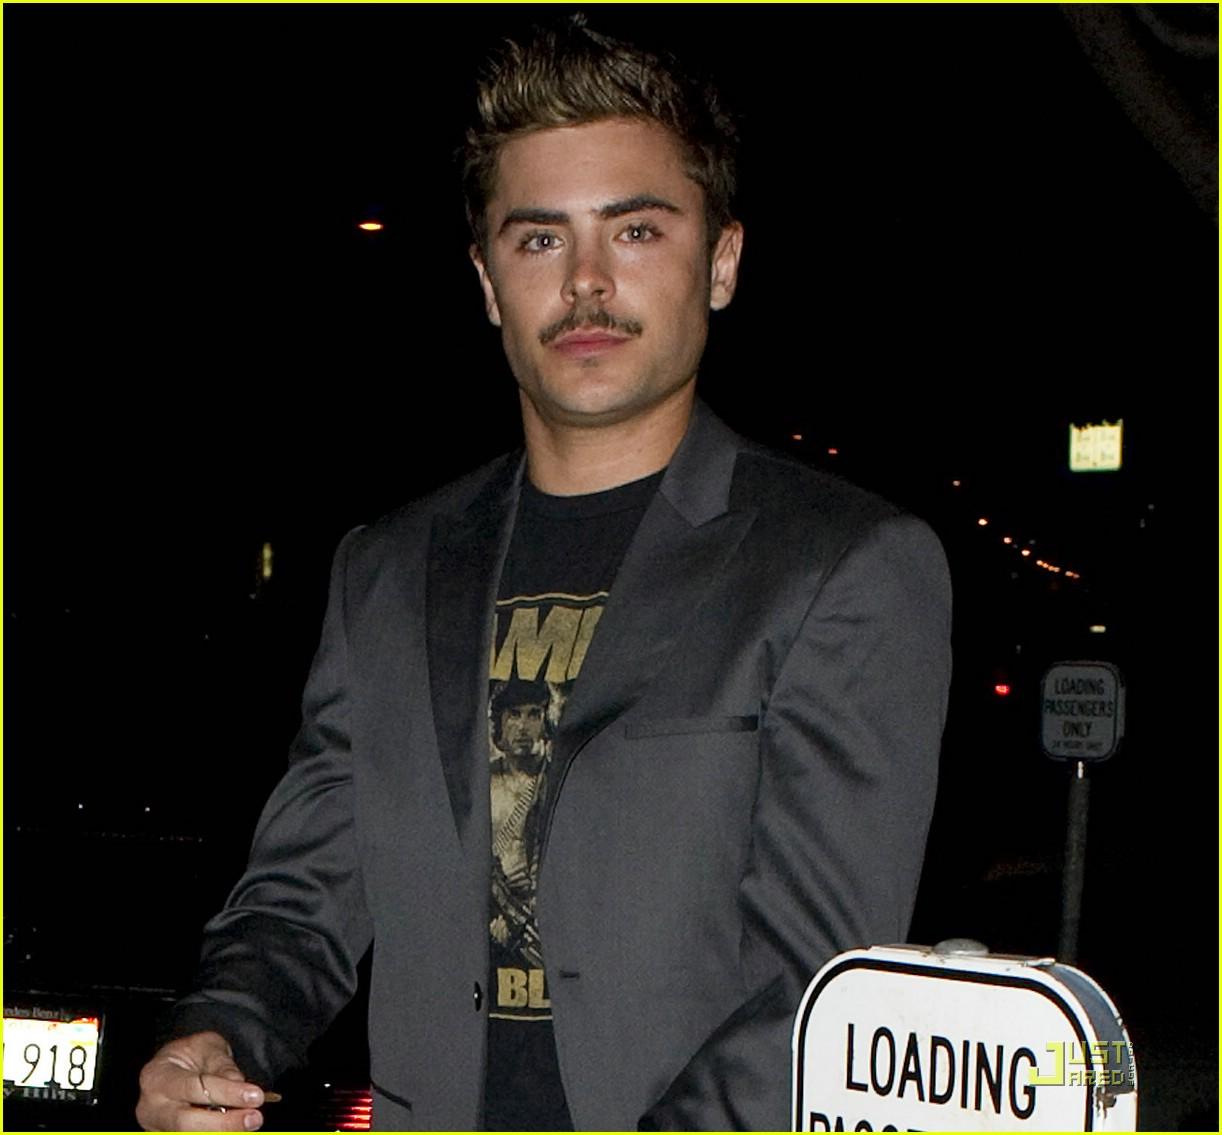 http://4.bp.blogspot.com/-i5X4FJ4z5a0/TZ6s1Z6zevI/AAAAAAAAAAM/jW303LPqRdY/s1600/zac-efron-coachella-mustache-05.jpg